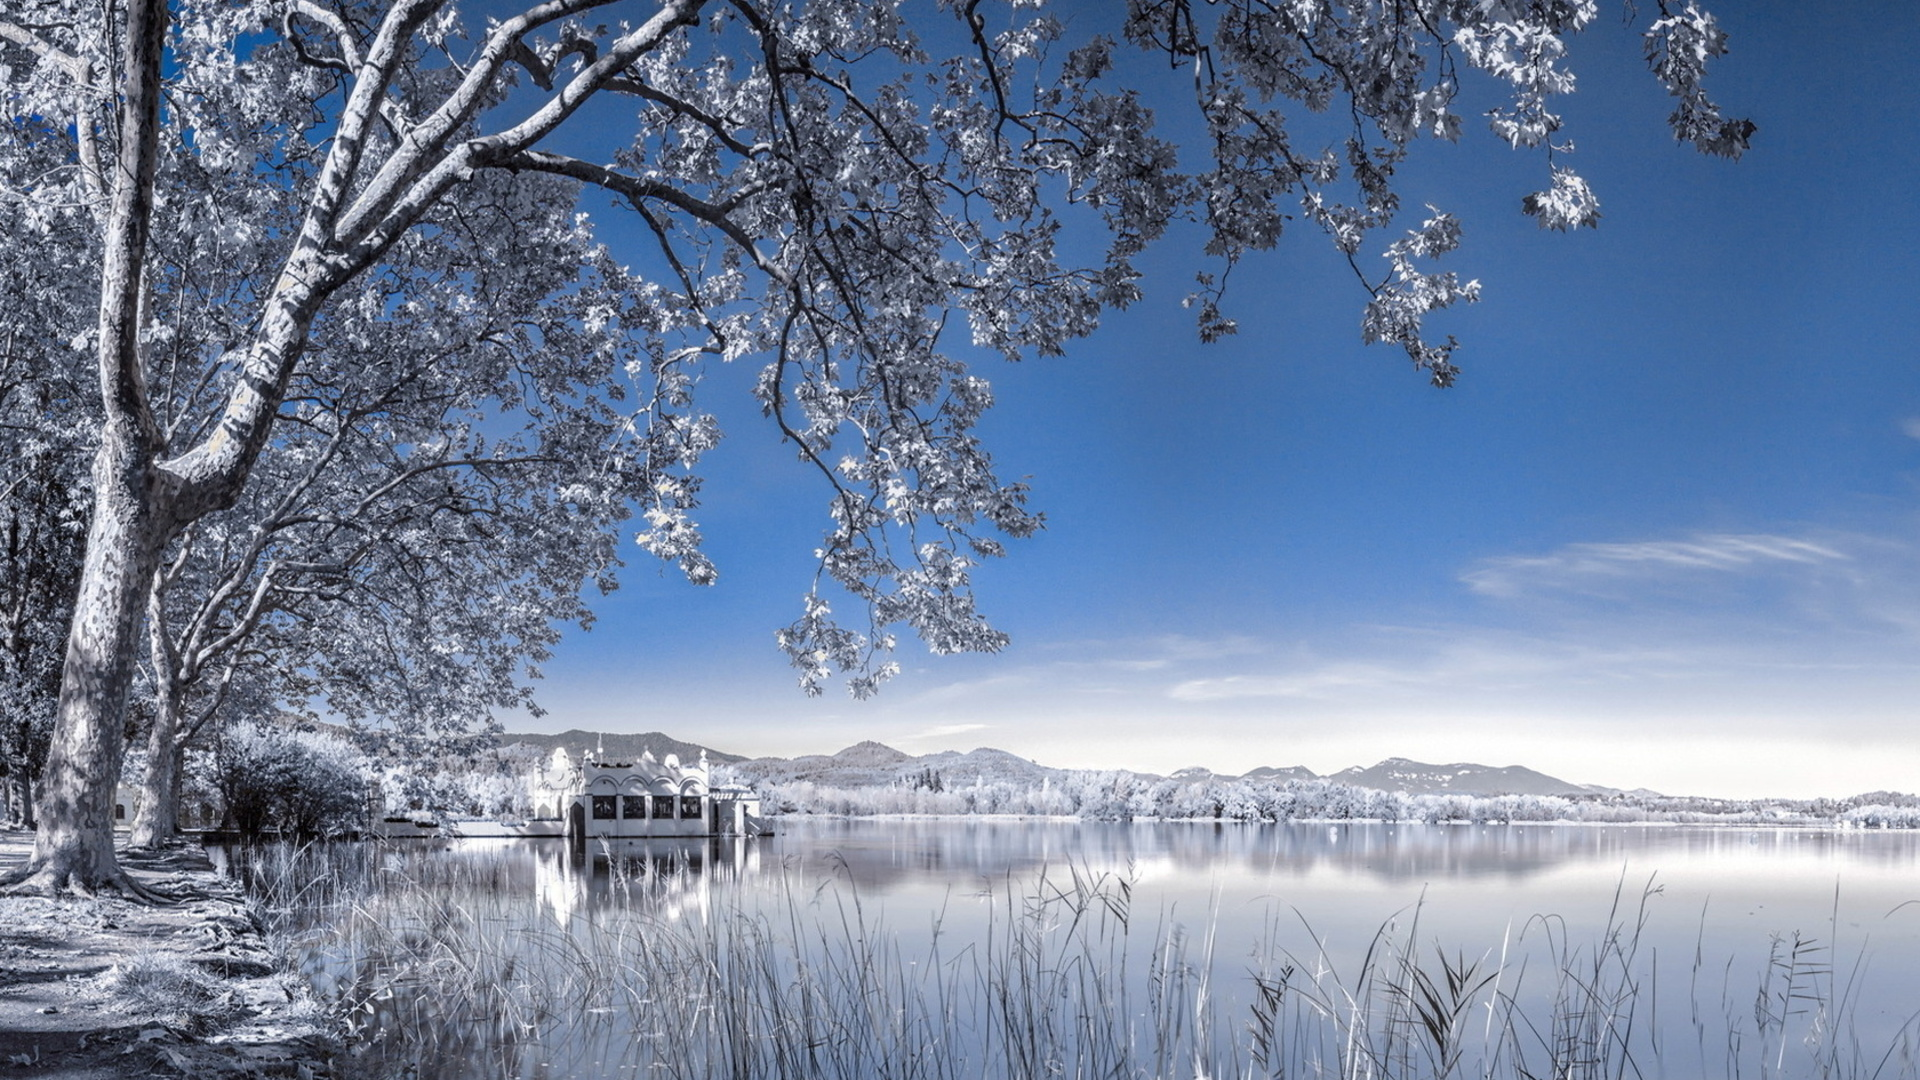 Winter Backgrounds for Desktop 1920x1080